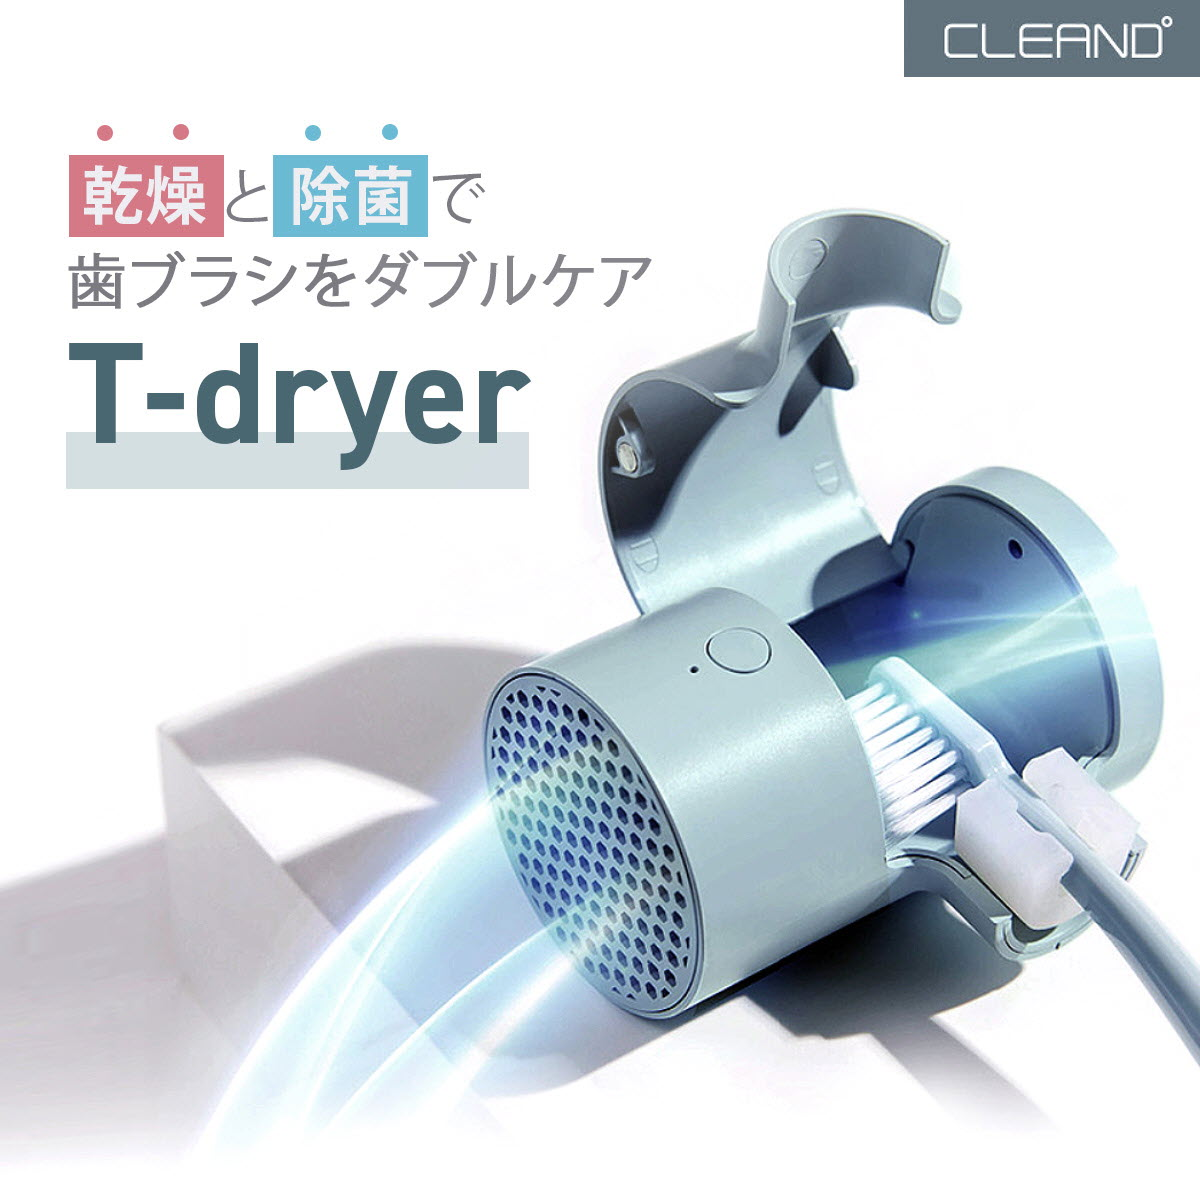 CLEAND 歯ブラシ UV除菌 乾燥器 T-dryer 【 UV除菌器 / コードレス/ USB Type-C 充電式 / 壁掛け可能 / 乾燥機 】